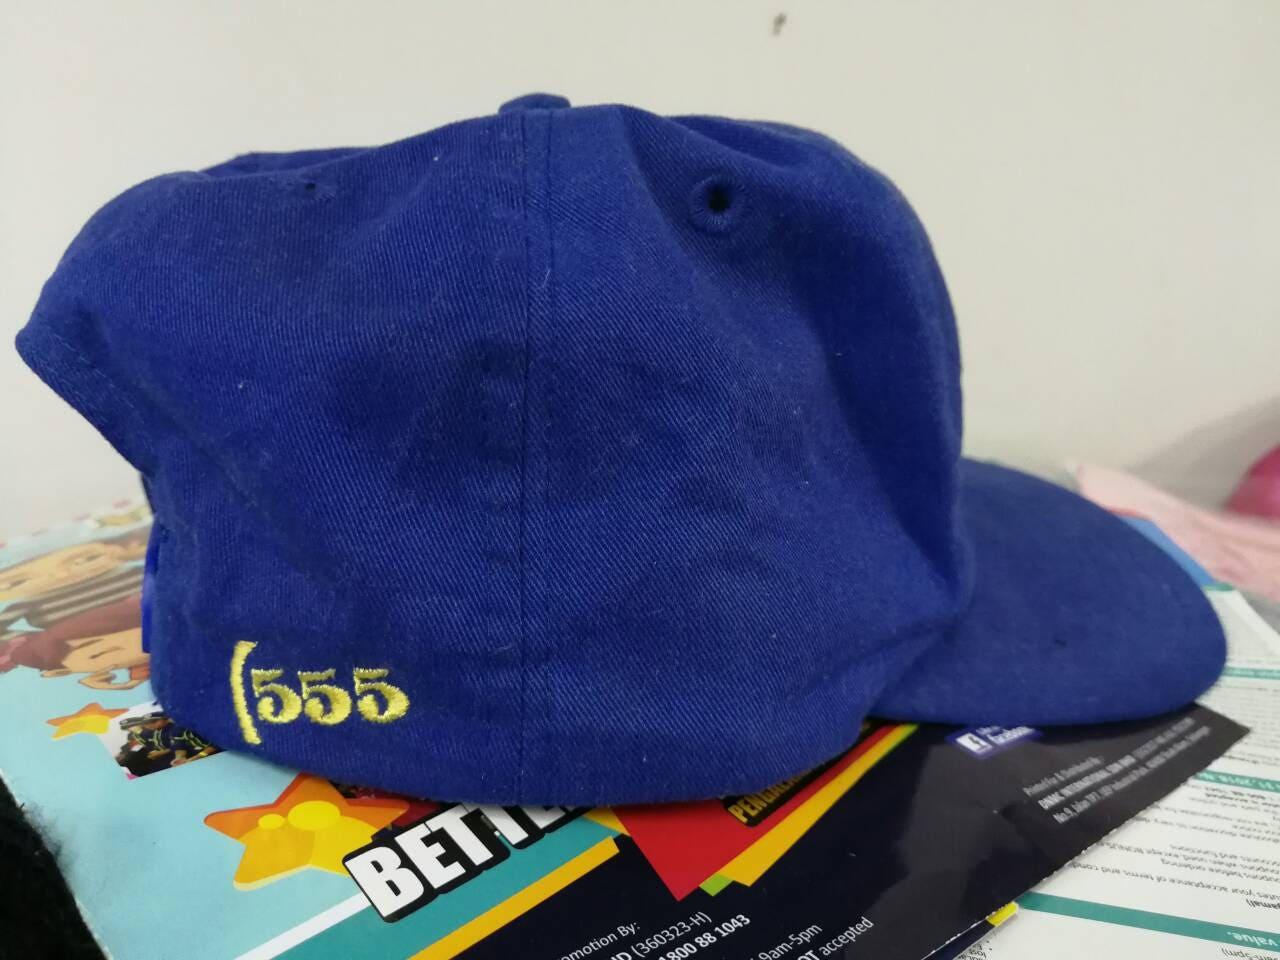 Vintage 80s subaru 555 world rally team cap free size ... 703cfd902b4